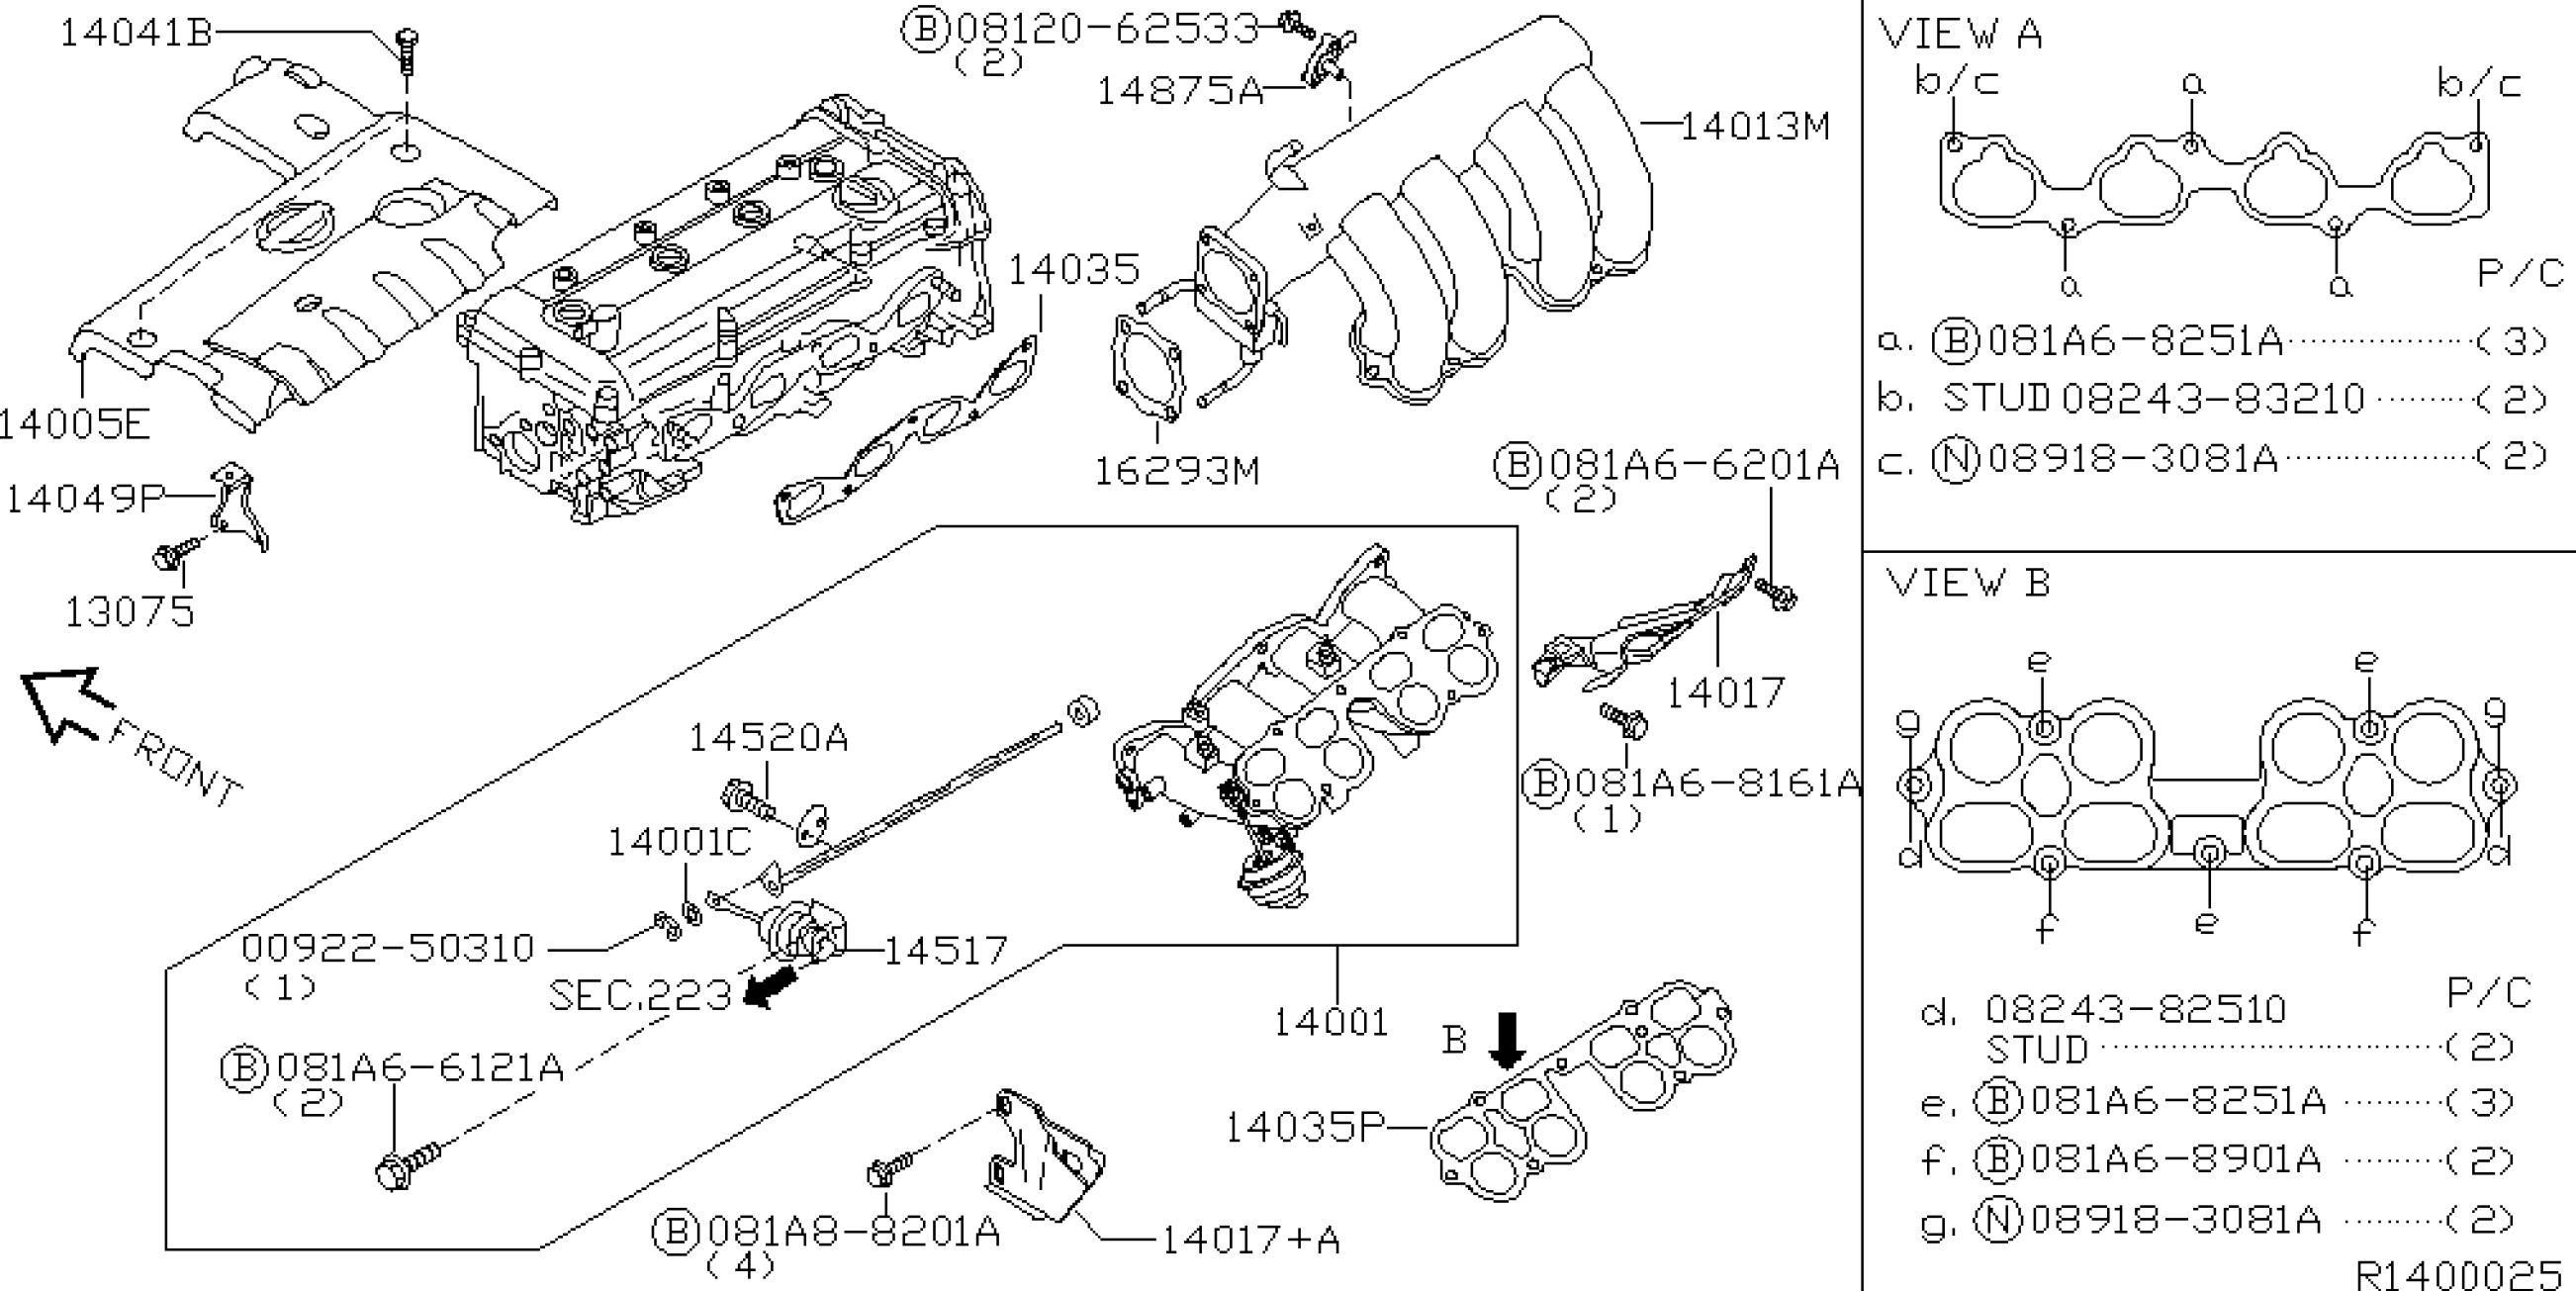 2005 Nissan Altima Engine Diagram Nissan Sentra Engine Diagram 1997 Nissan Sentra 2007 Kia Spectra Of 2005 Nissan Altima Engine Diagram